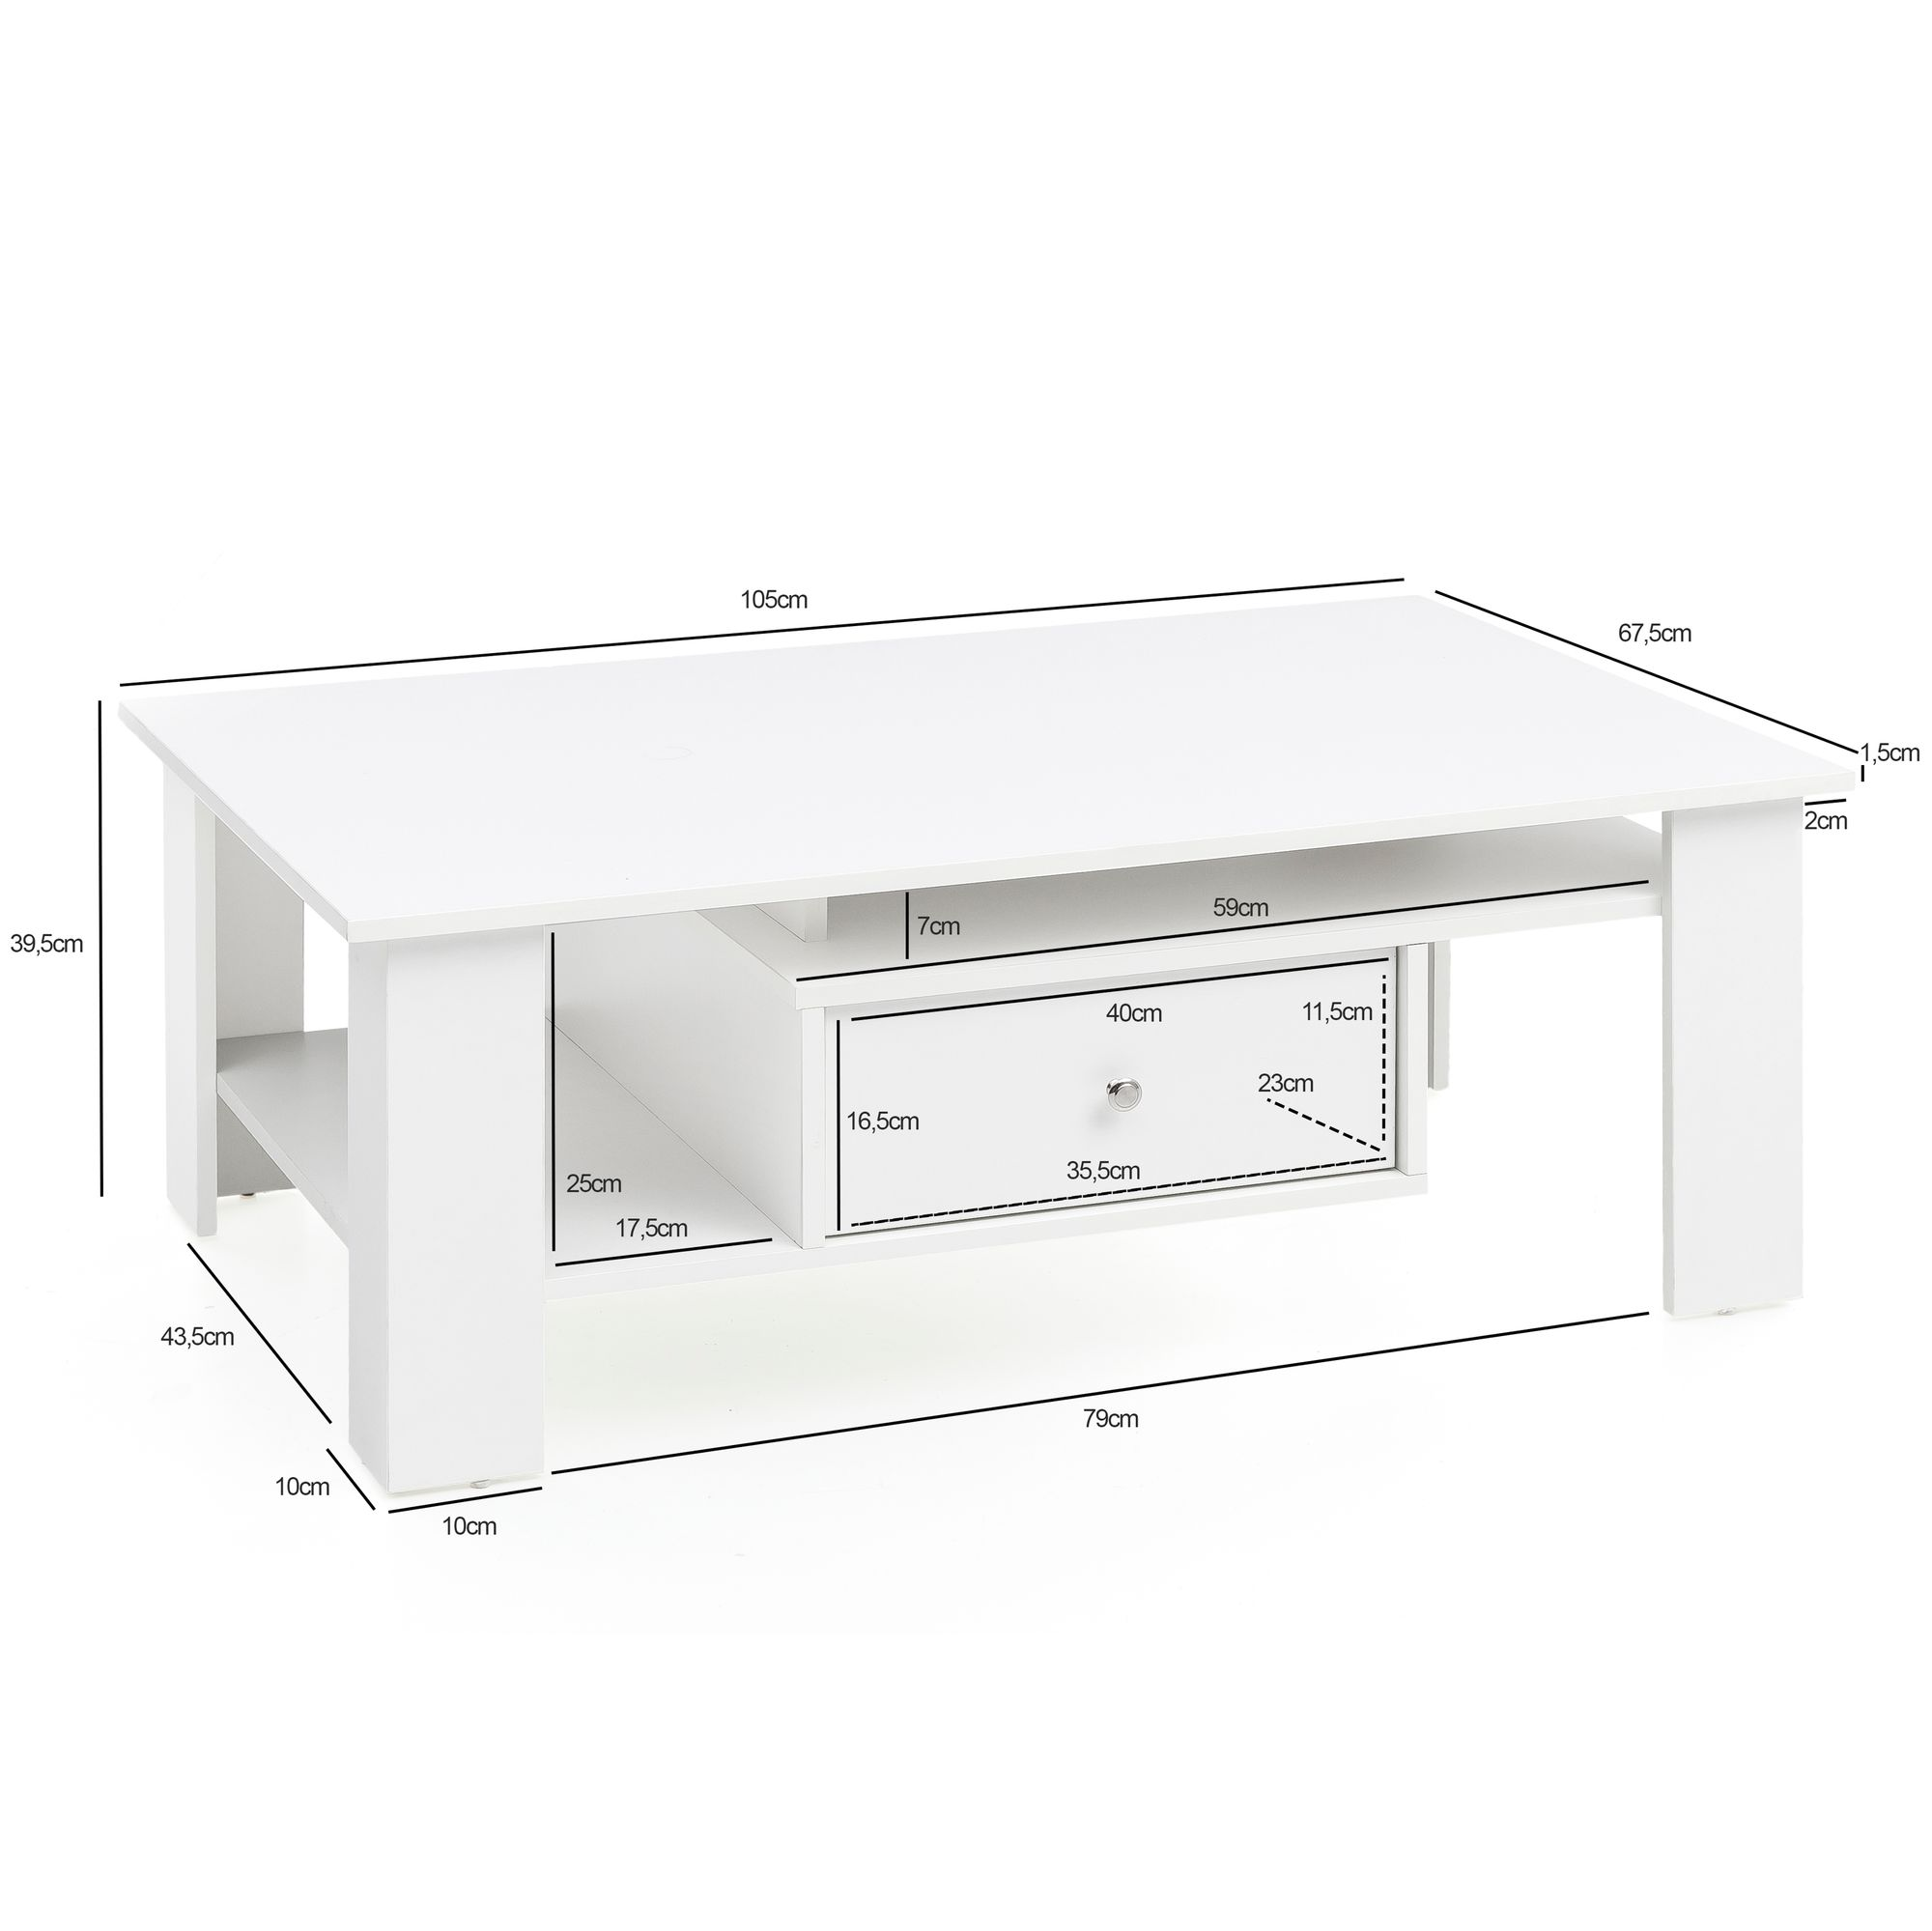 Wohnling Design Couchtisch Liva 105x39 5x67 5 Cm Weiss Matt